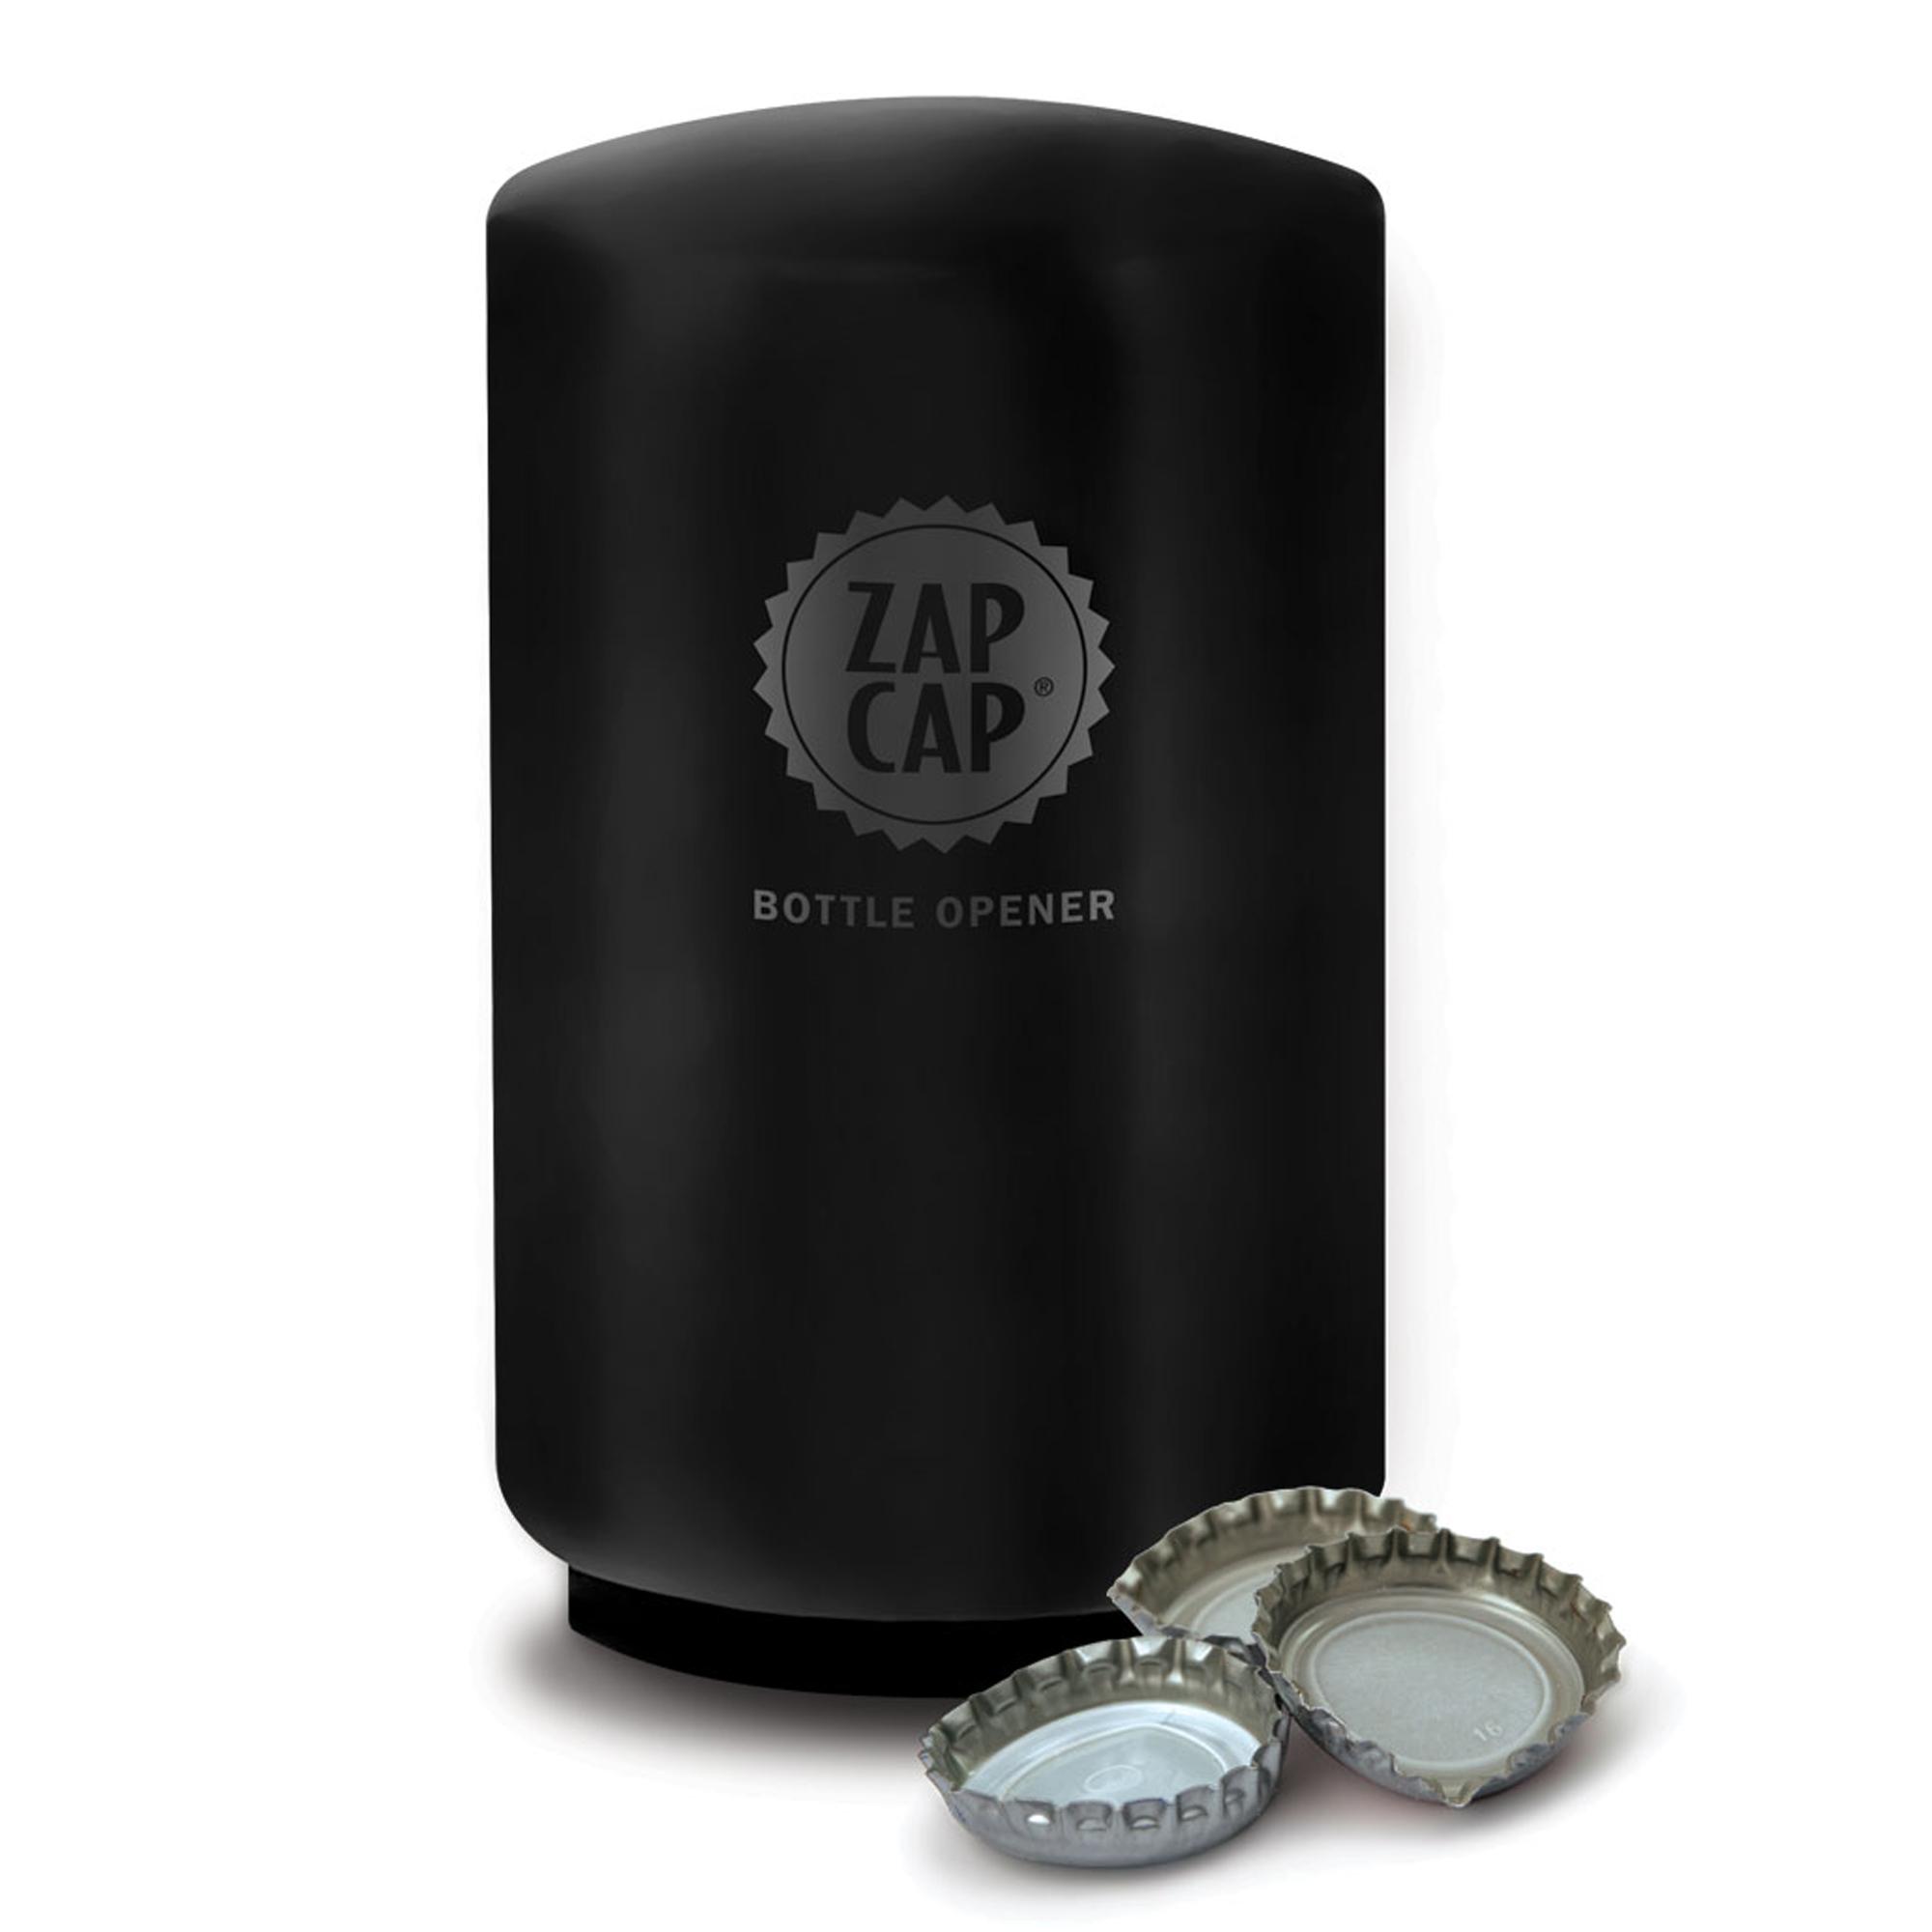 zap cap premium bottle opener drinkstuff. Black Bedroom Furniture Sets. Home Design Ideas